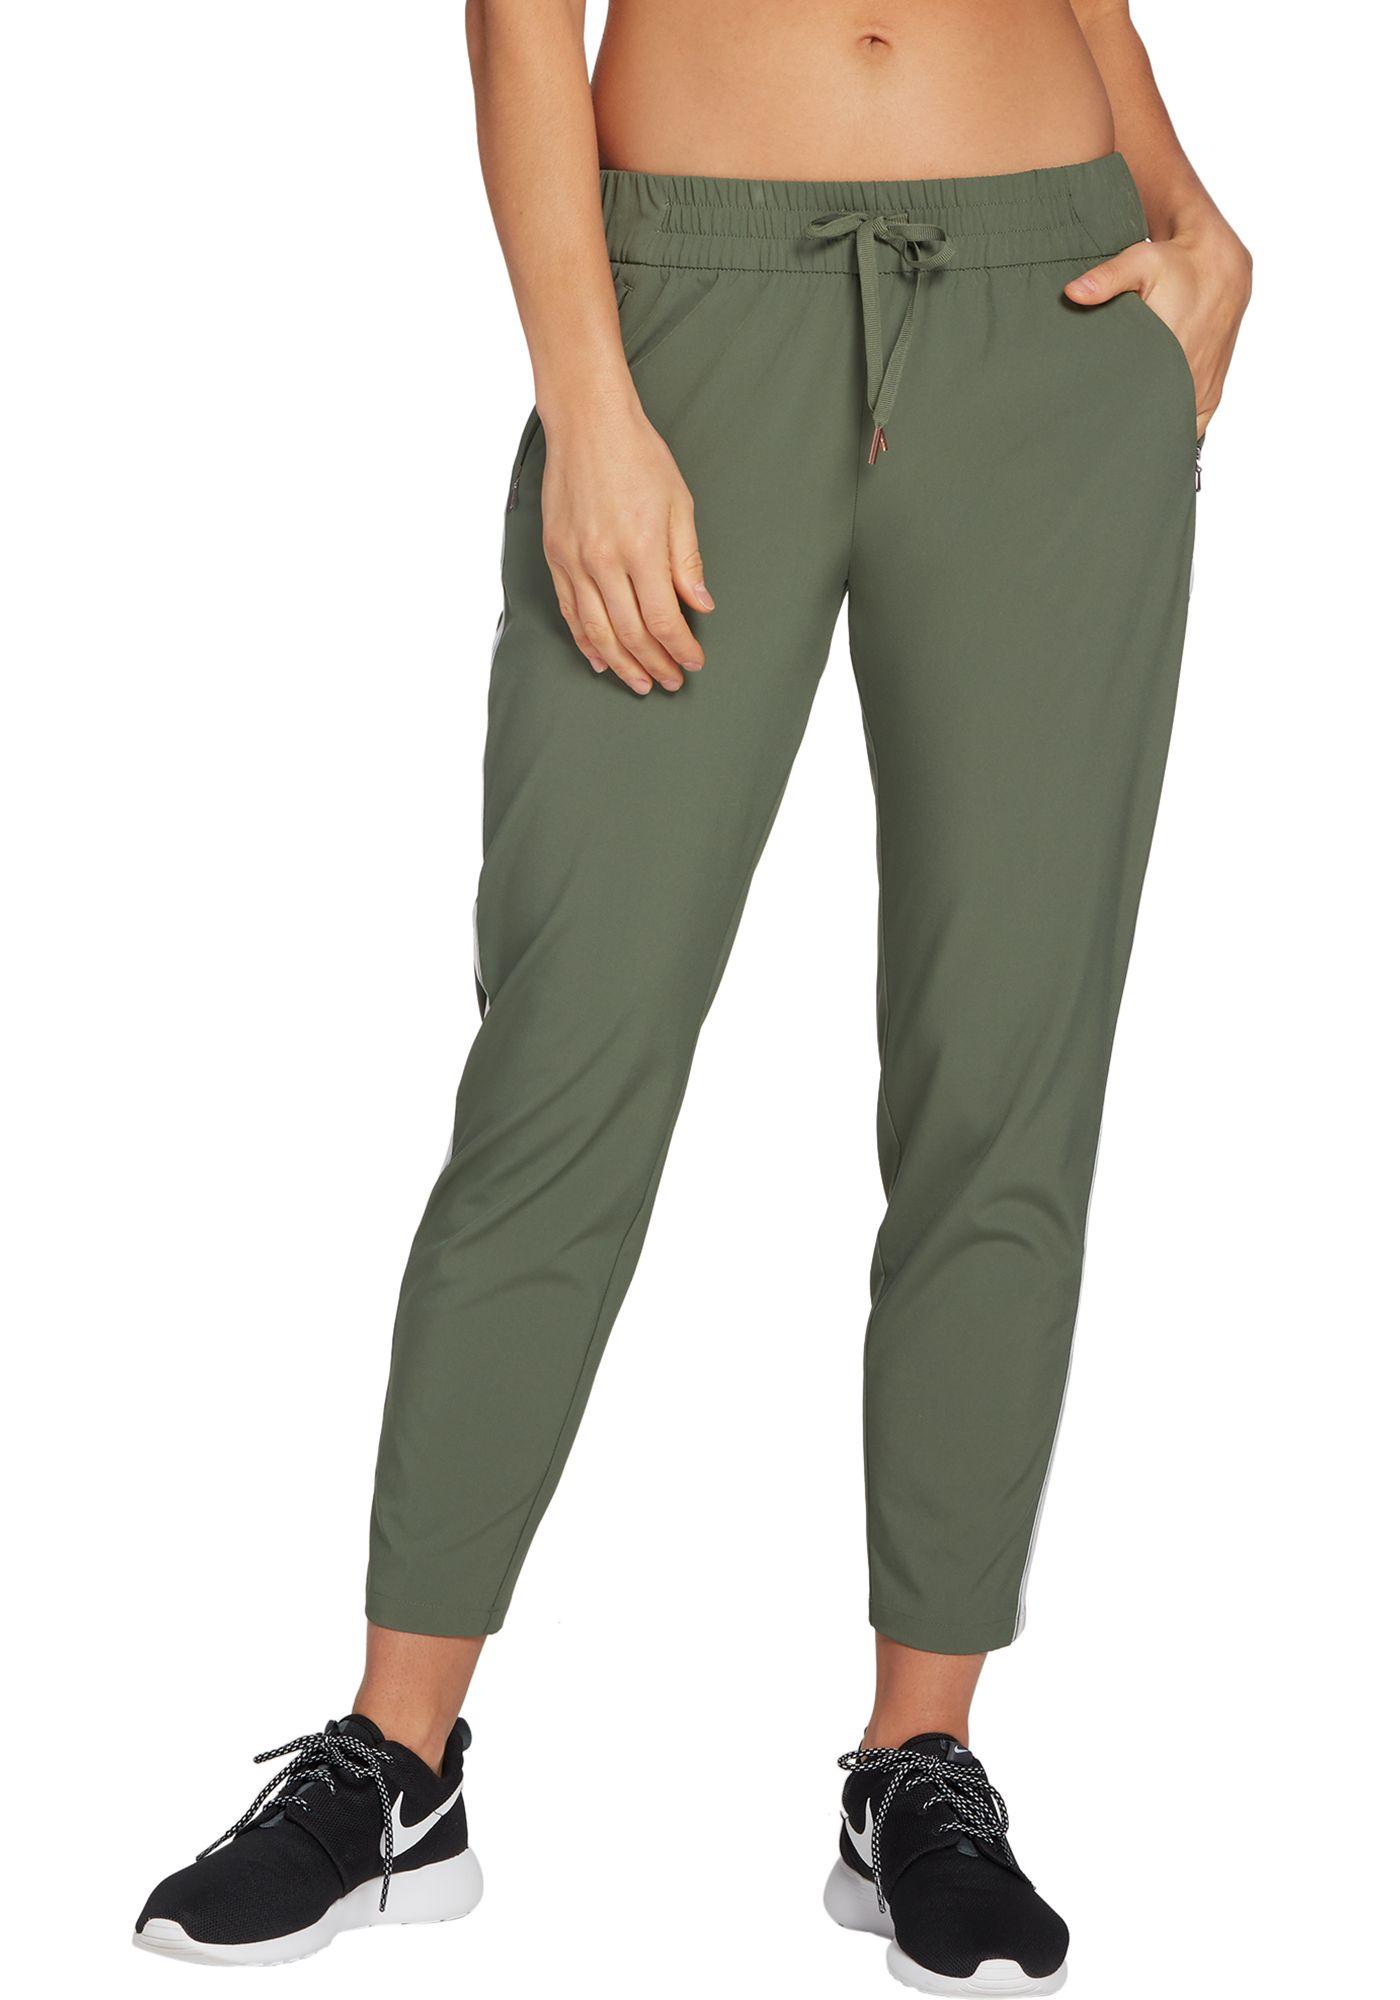 CALIA by Carrie Underwood Women's Journey Tuxedo Pants